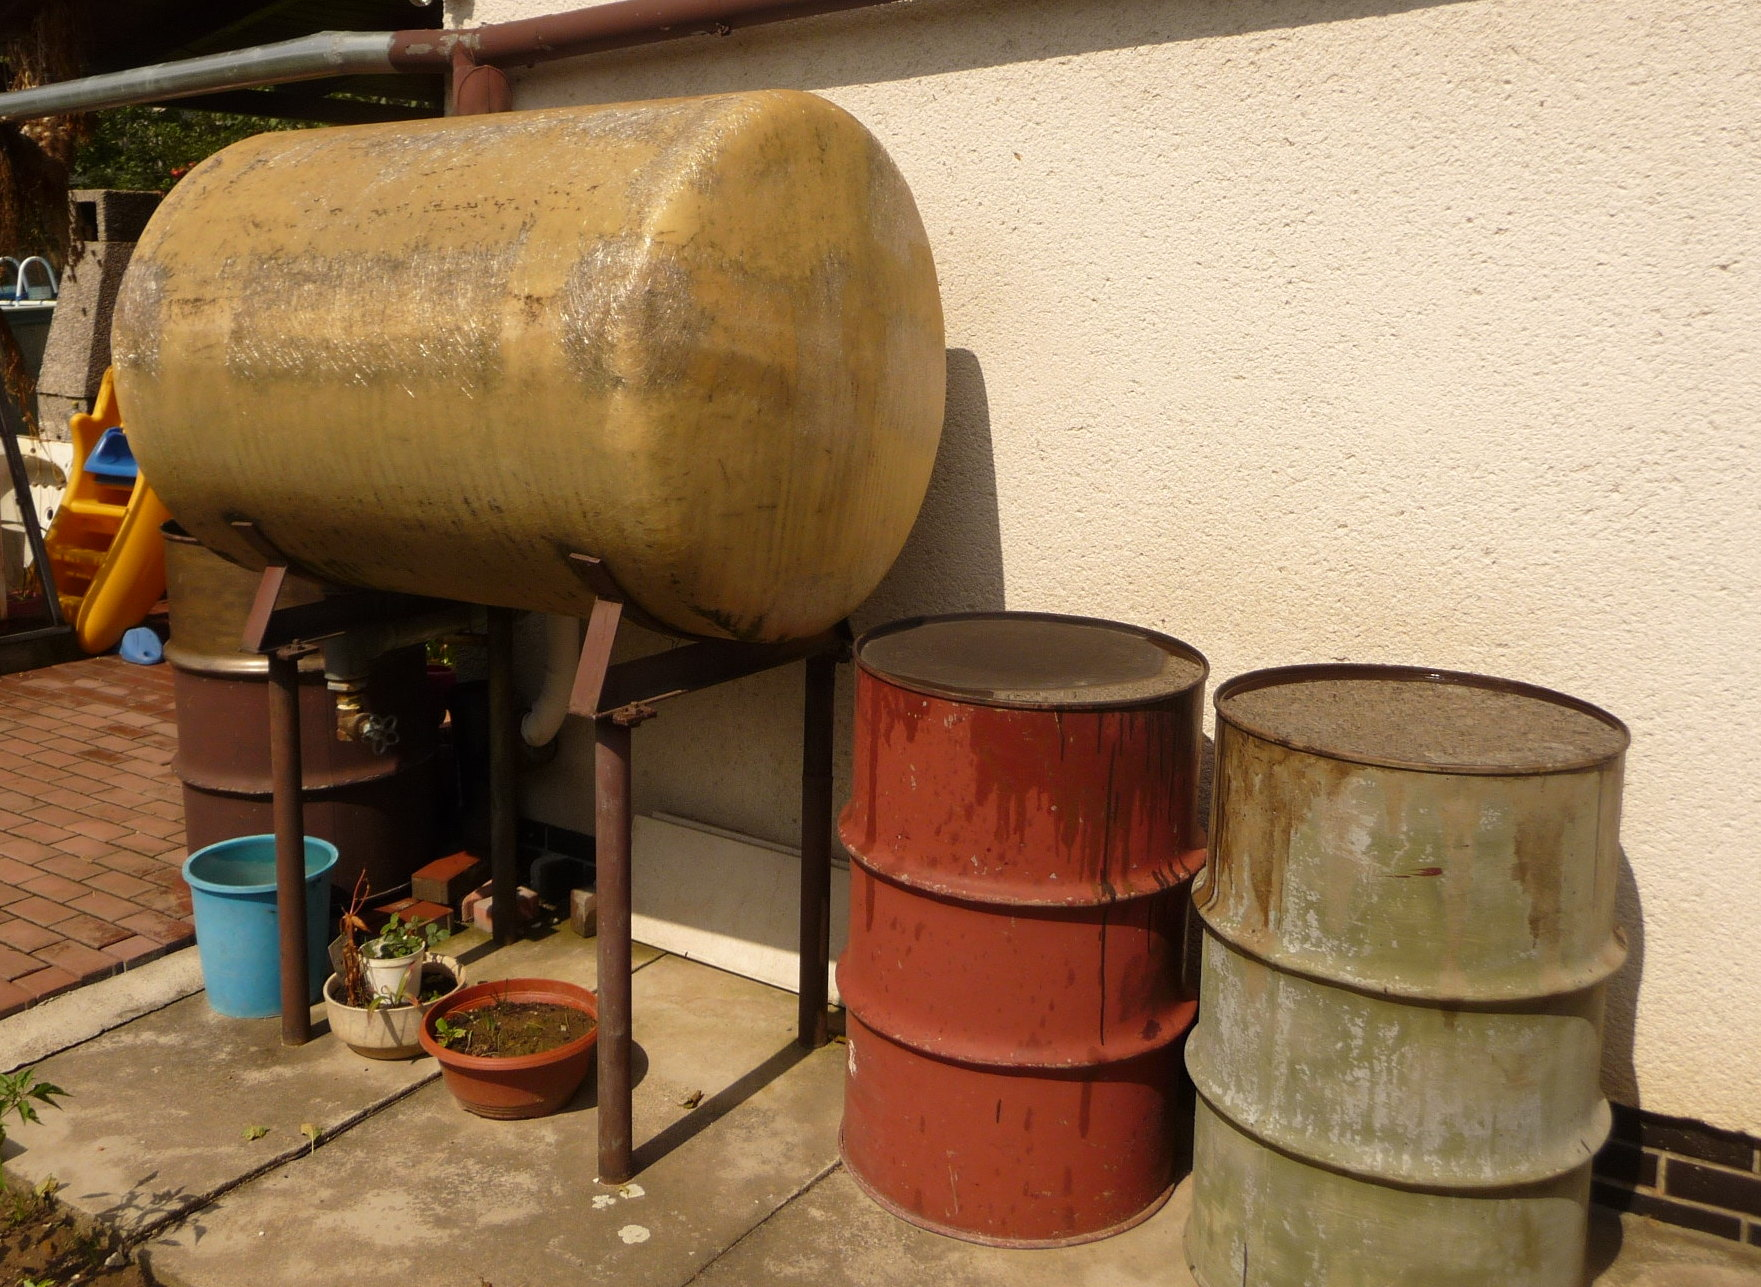 File:Rainwater tank, Fryšták.jpg